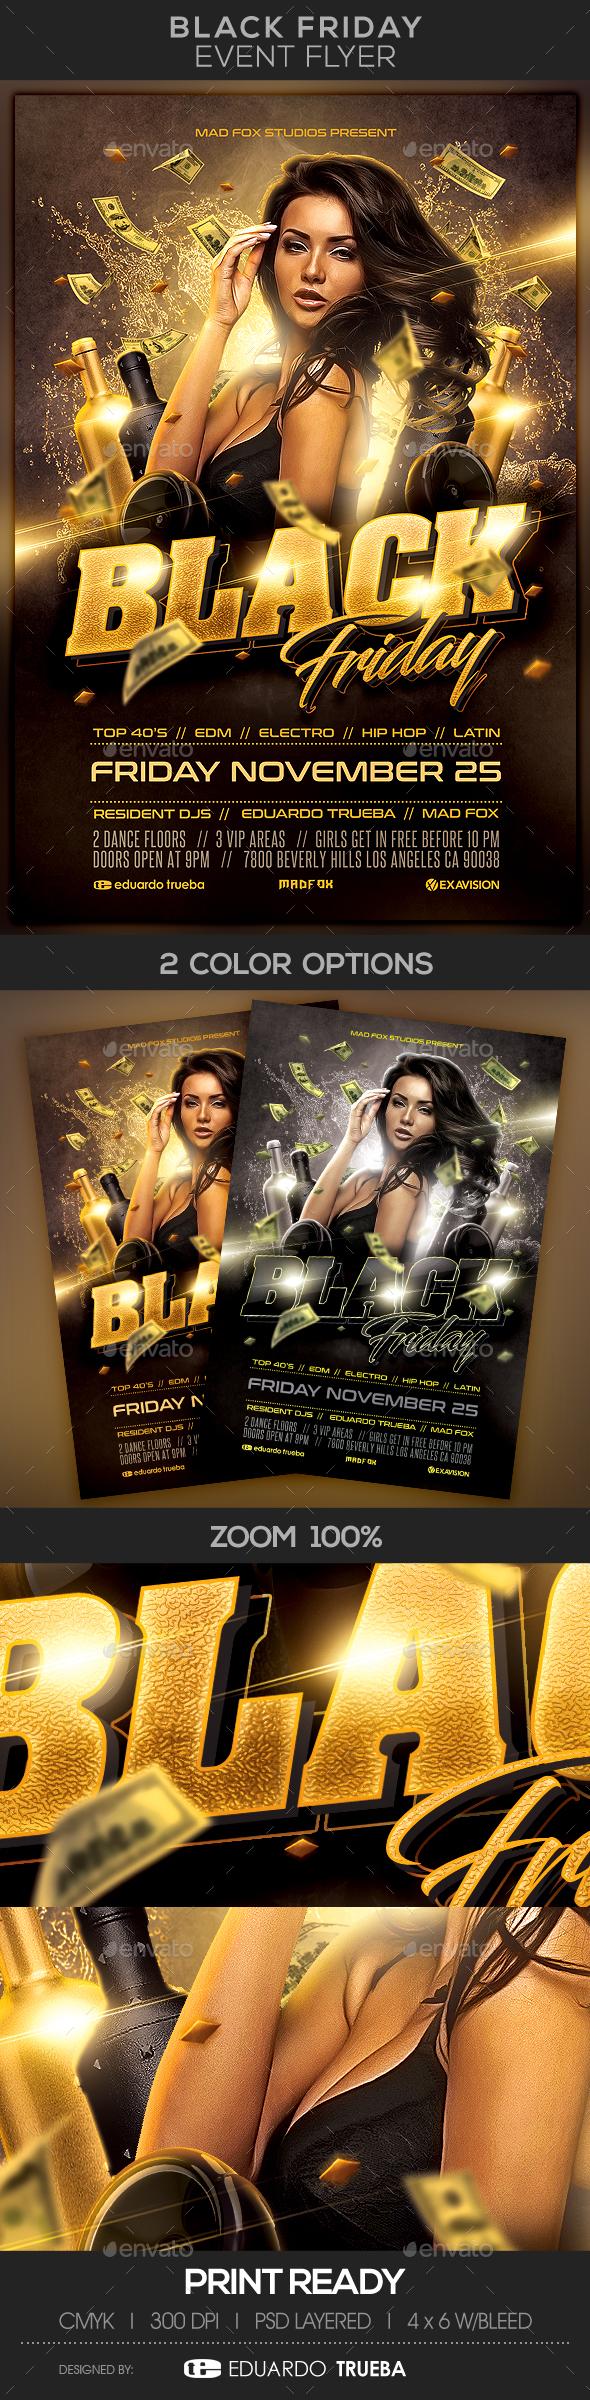 Black Friday Event Flyer - Flyers Print Templates